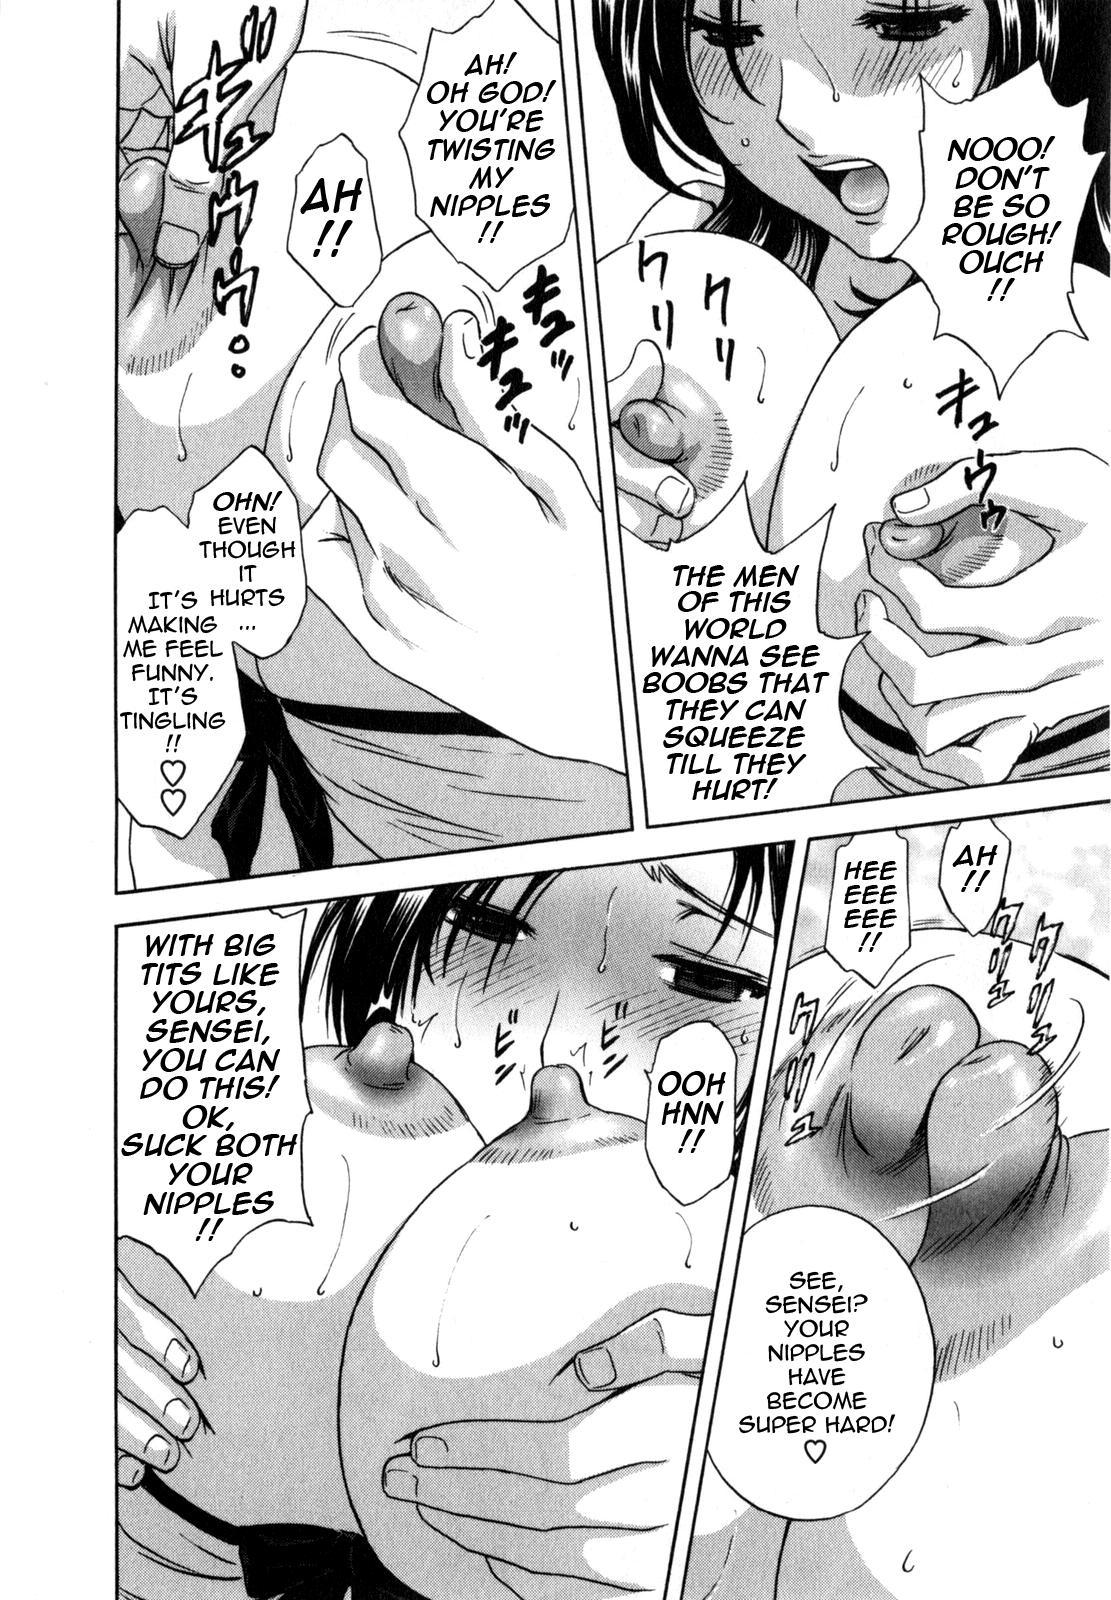 [Hidemaru] Life with Married Women Just Like a Manga 1 - Ch. 1-3 [English] {Tadanohito} 20